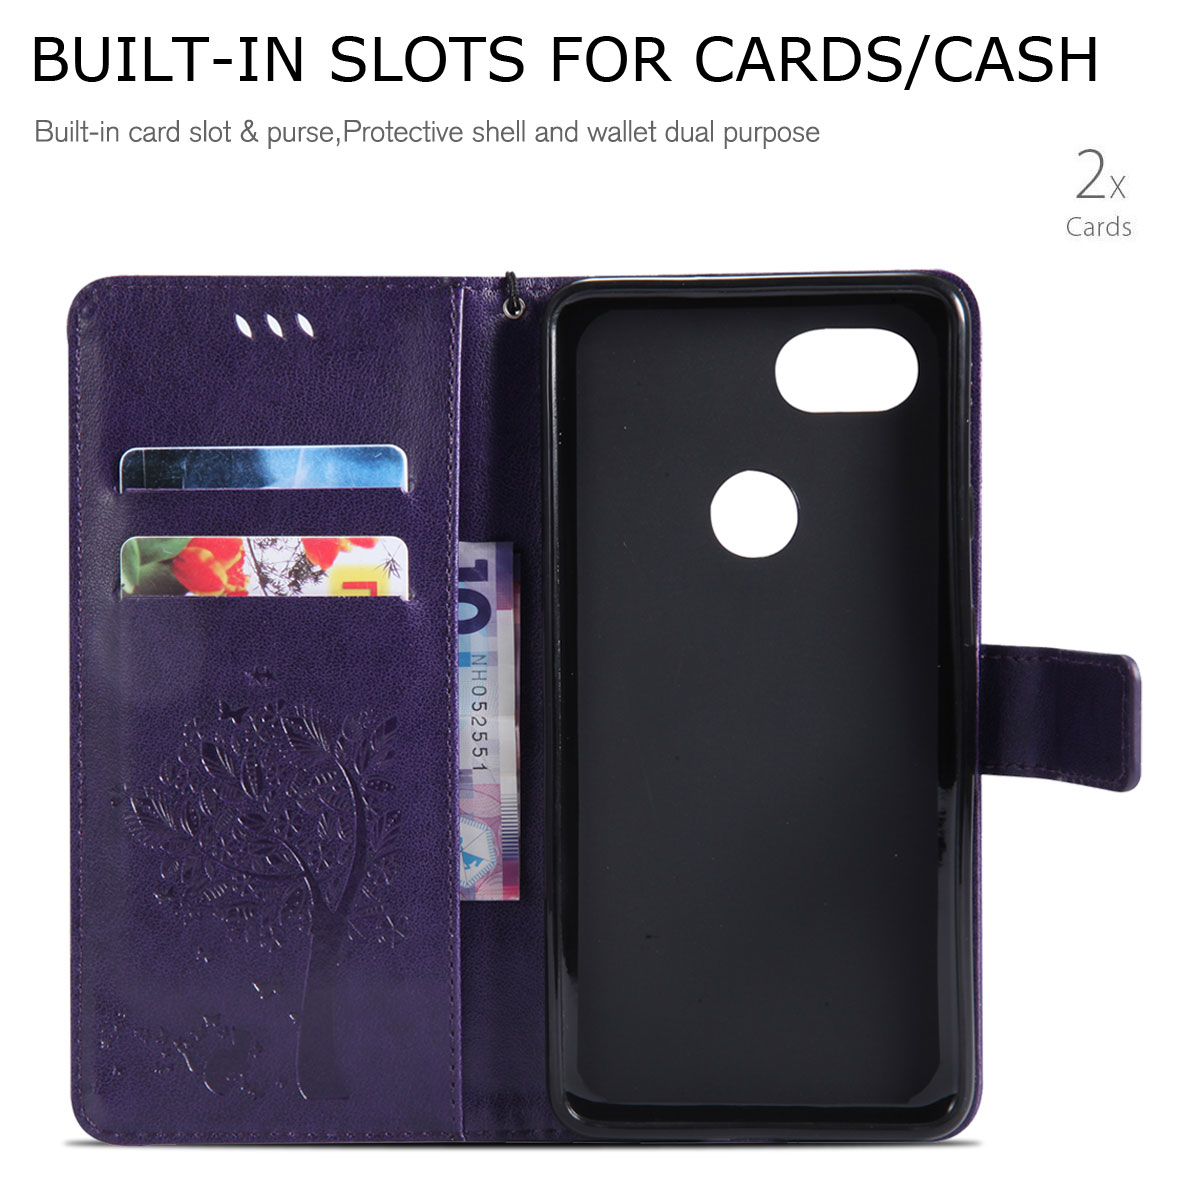 Magnetic-Leather-Credit-Card-Holder-Flip-Case-Cover-For-Google-Pixel-2-2-XL thumbnail 69